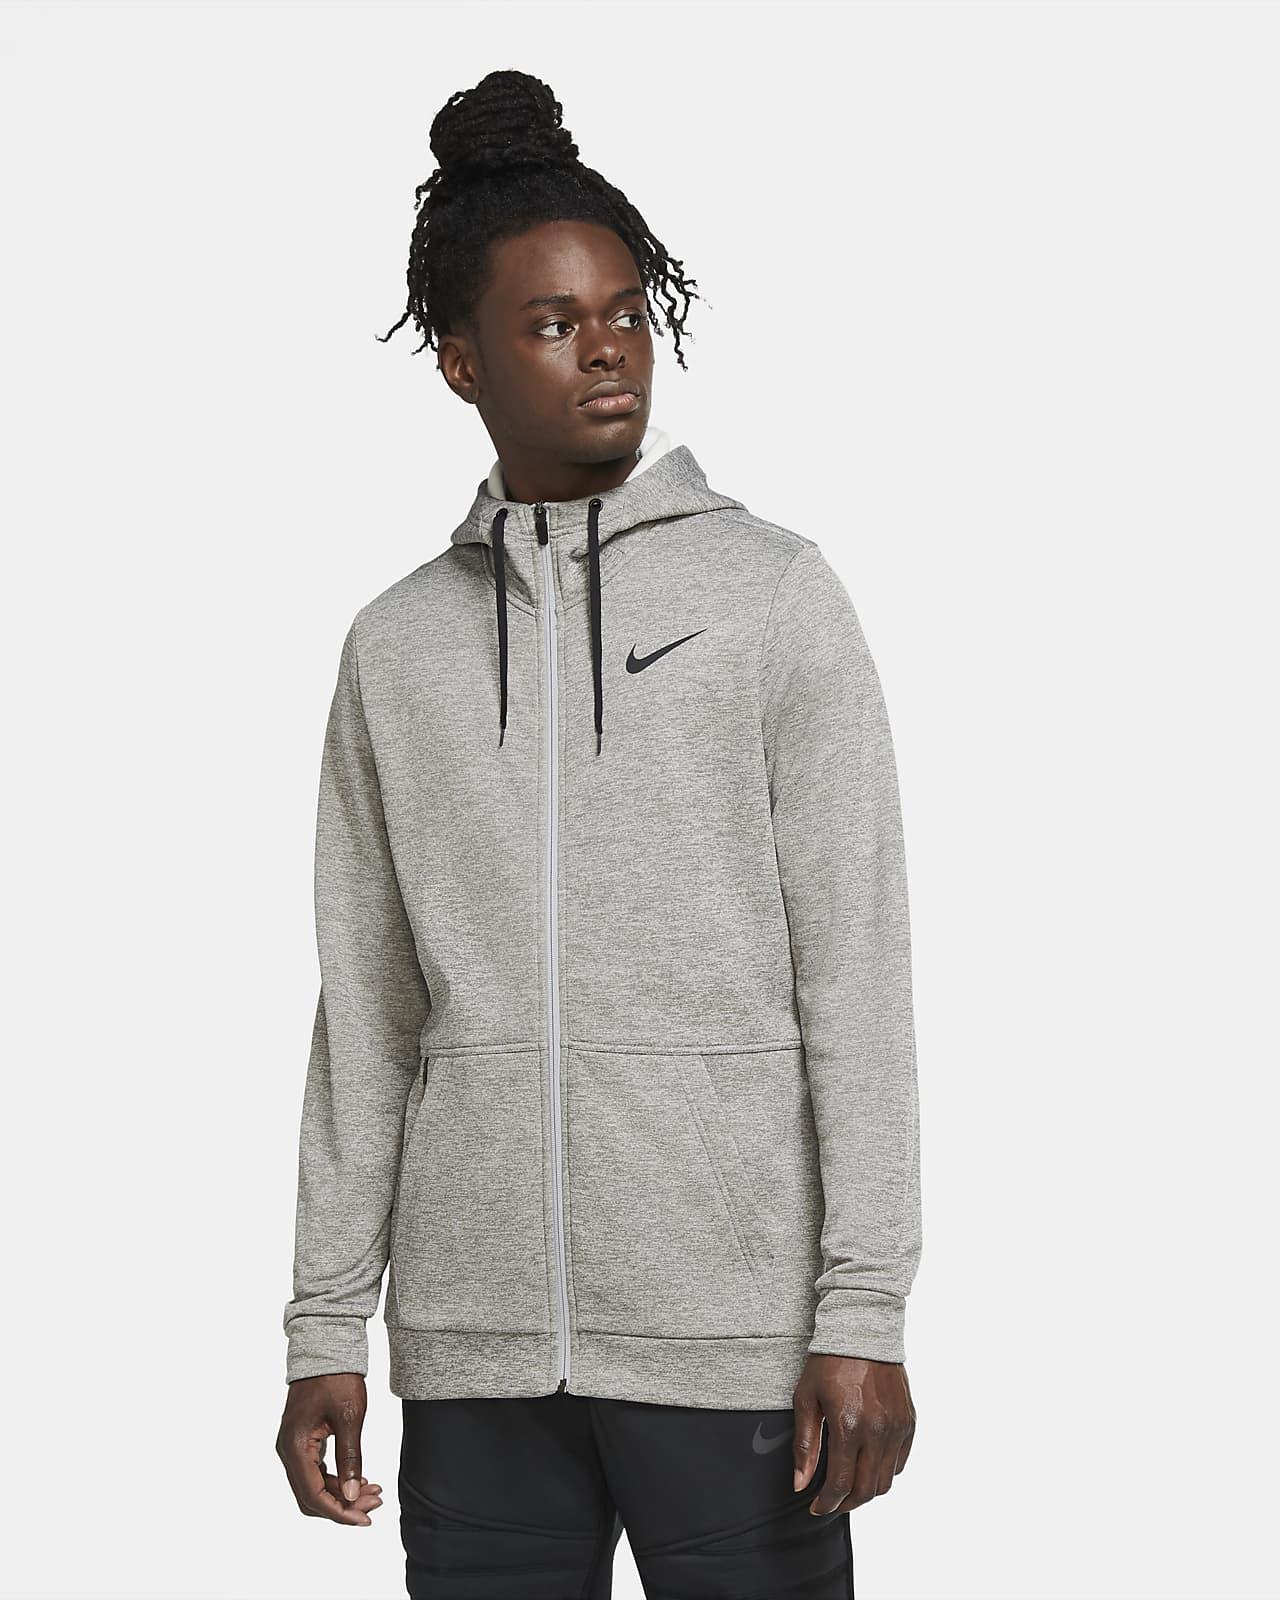 Męska rozpinana bluza treningowa z kapturem Nike Therma